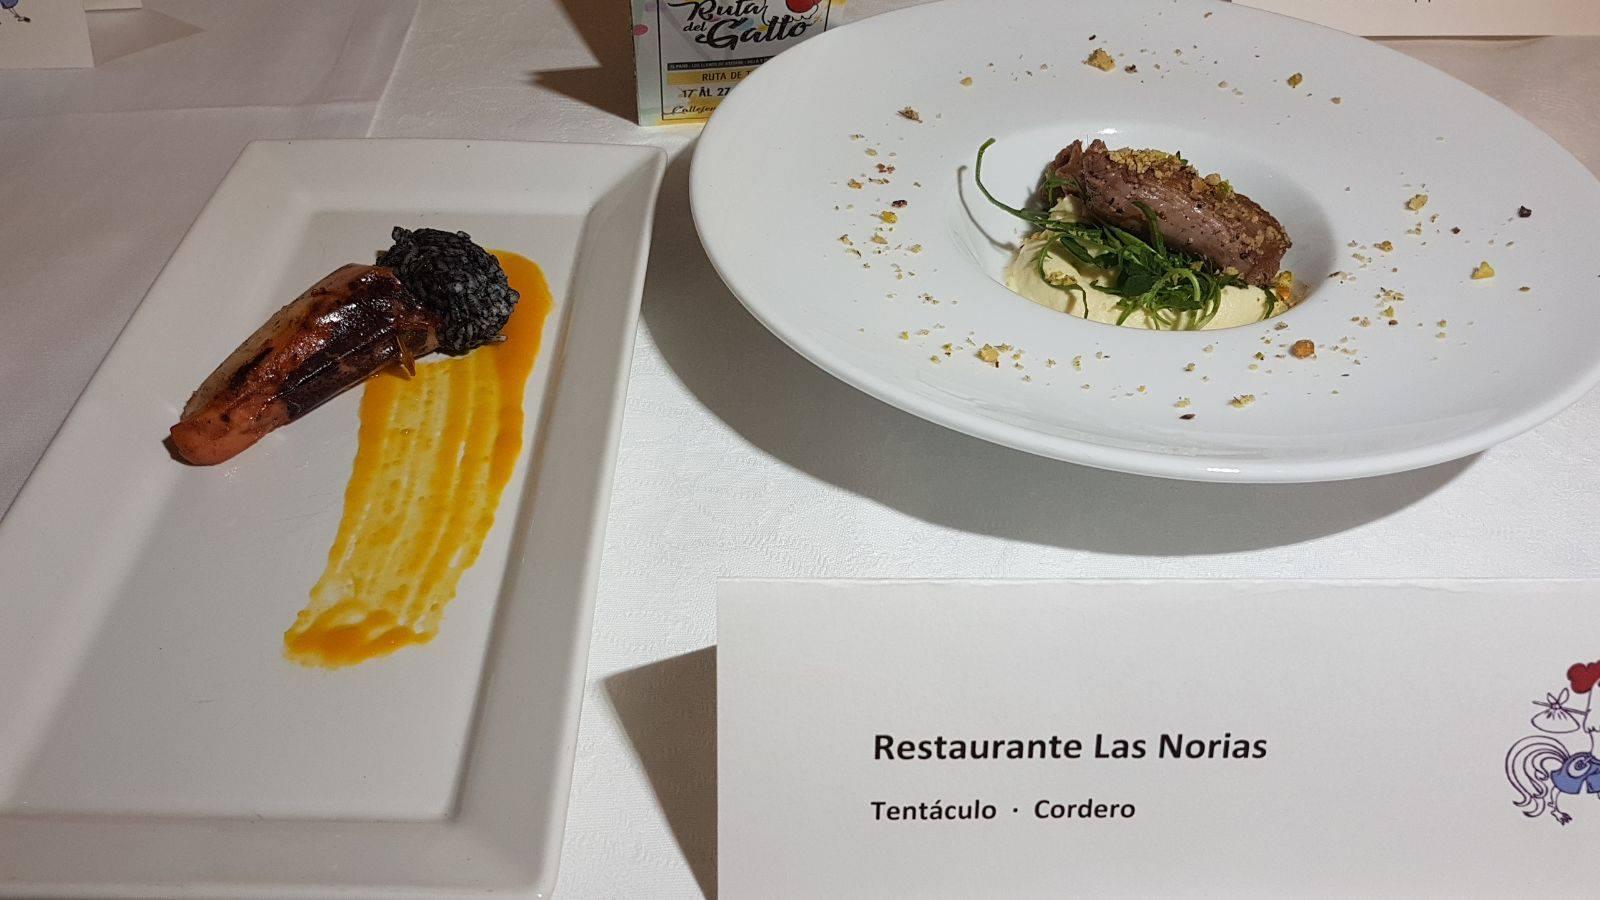 Premio Gallo de Plata para restaurante Las Norias